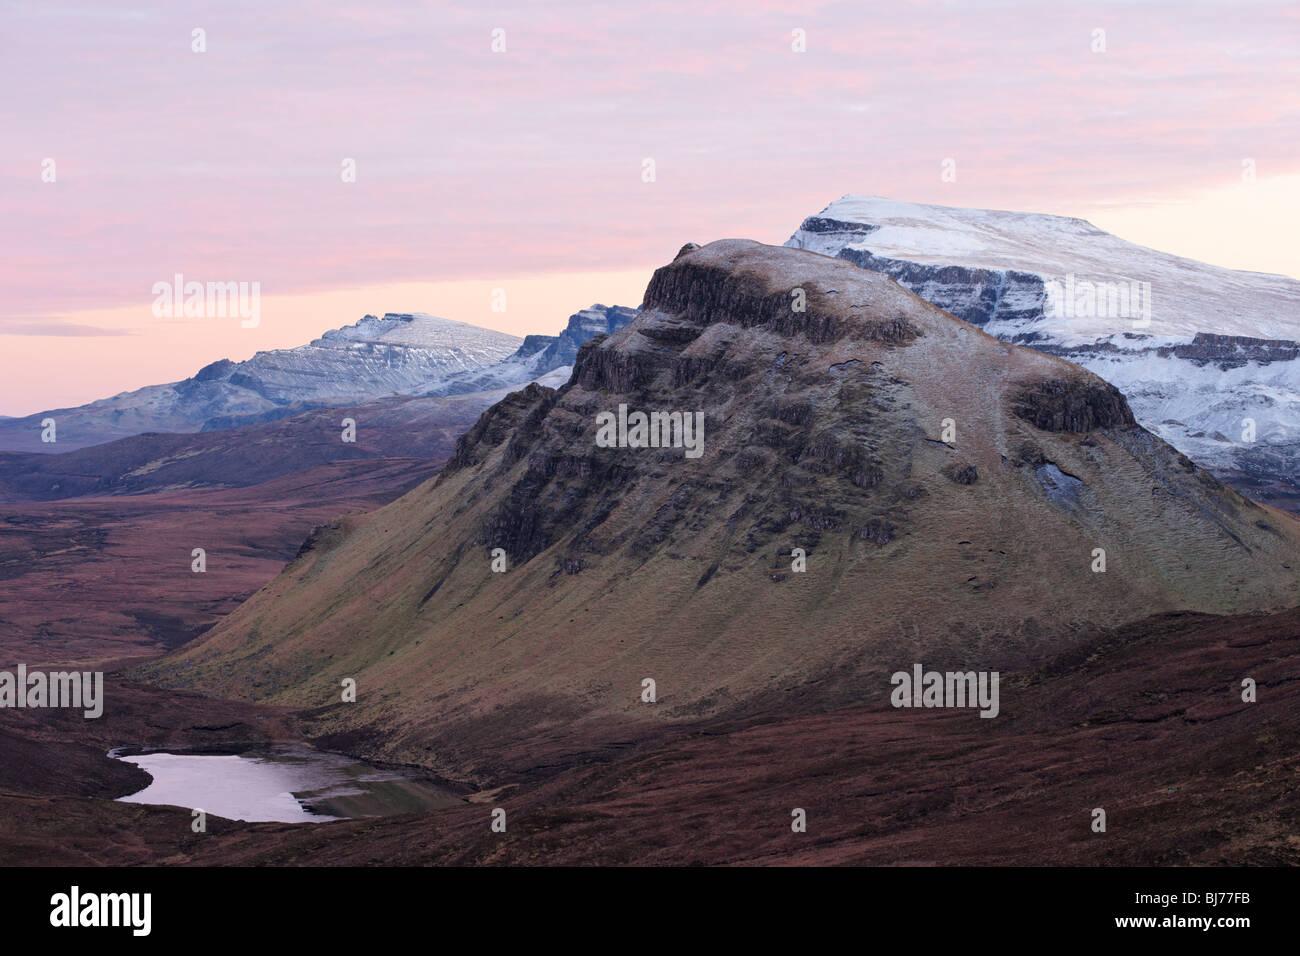 View along the Trotternish scarp slope to Cleat, Isle of Skye, Scotland, UK. - Stock Image